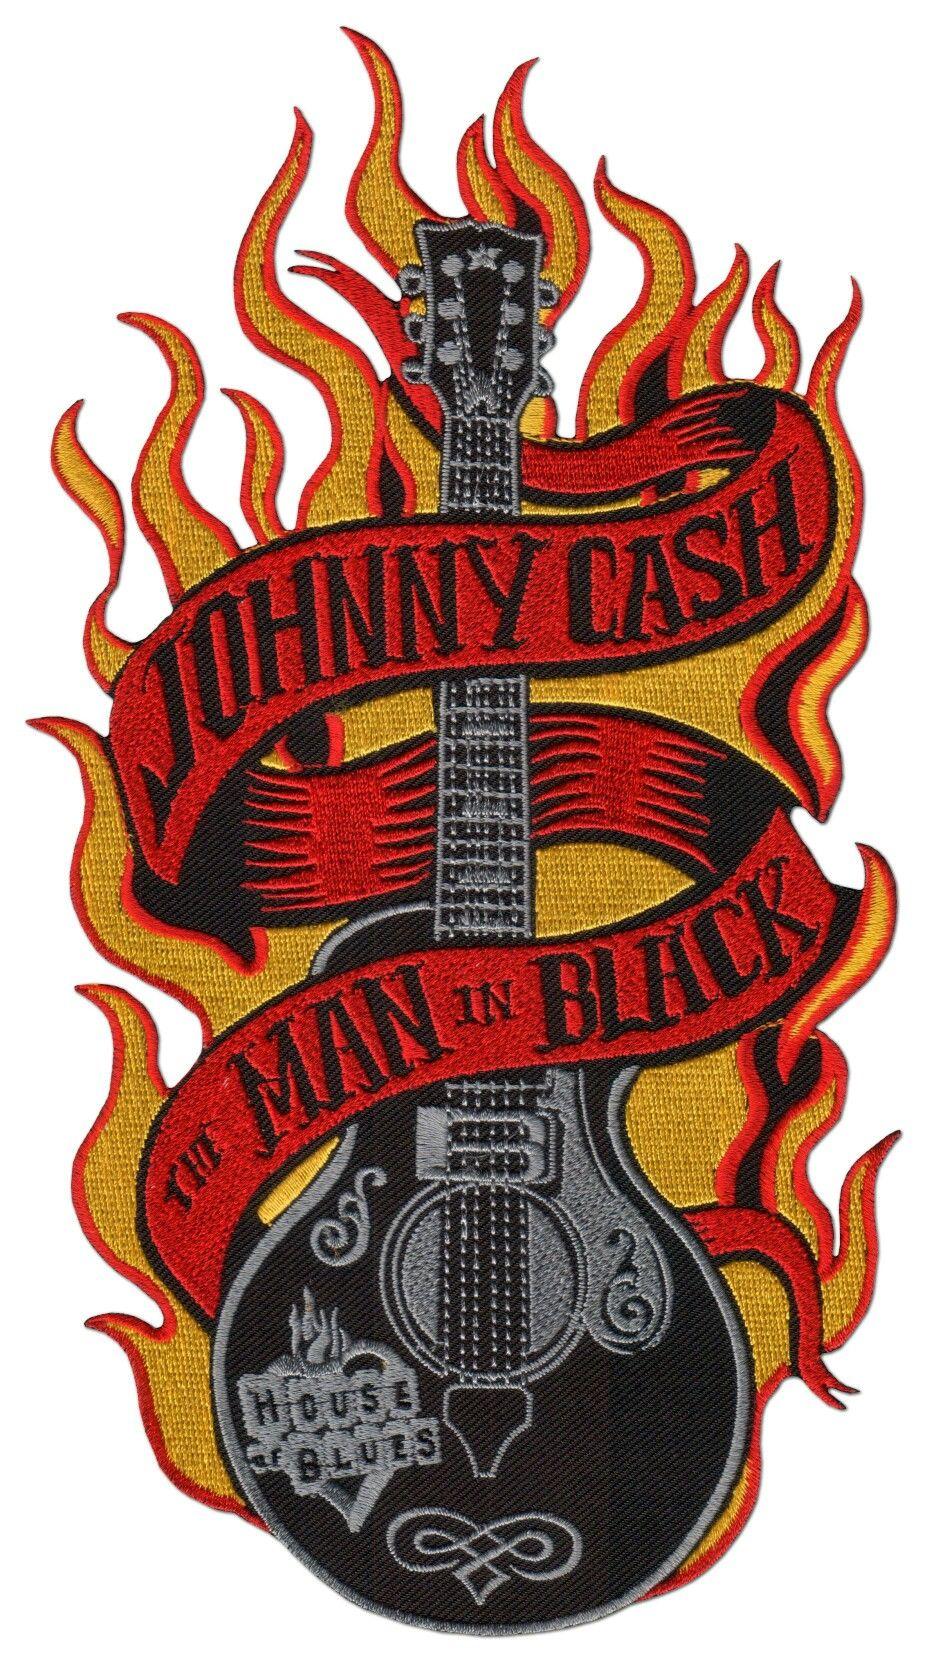 johnny cash the man in black johnny cash pinterest johnny cash and music tattoos. Black Bedroom Furniture Sets. Home Design Ideas